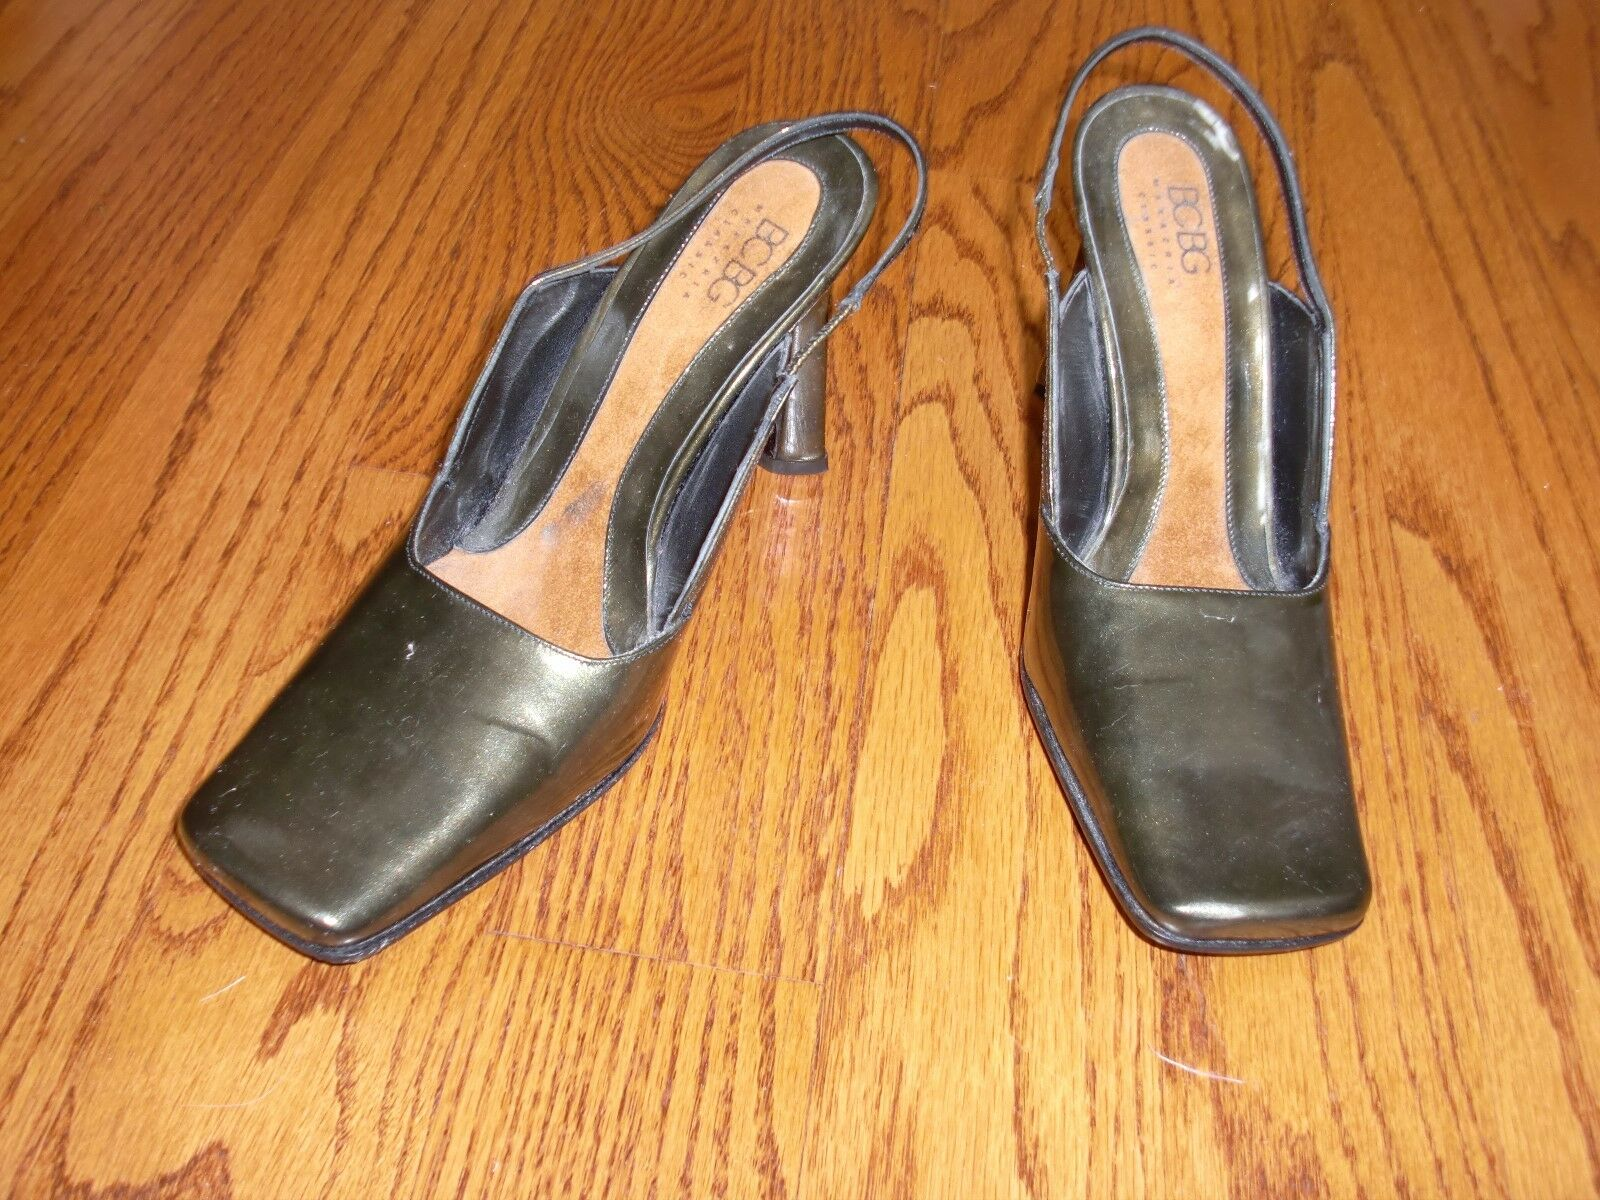 NWOT   Damenschuhe BCBG MAX AZRIA Army Green Leder Schuhes Heels Größe 7 M ITALY